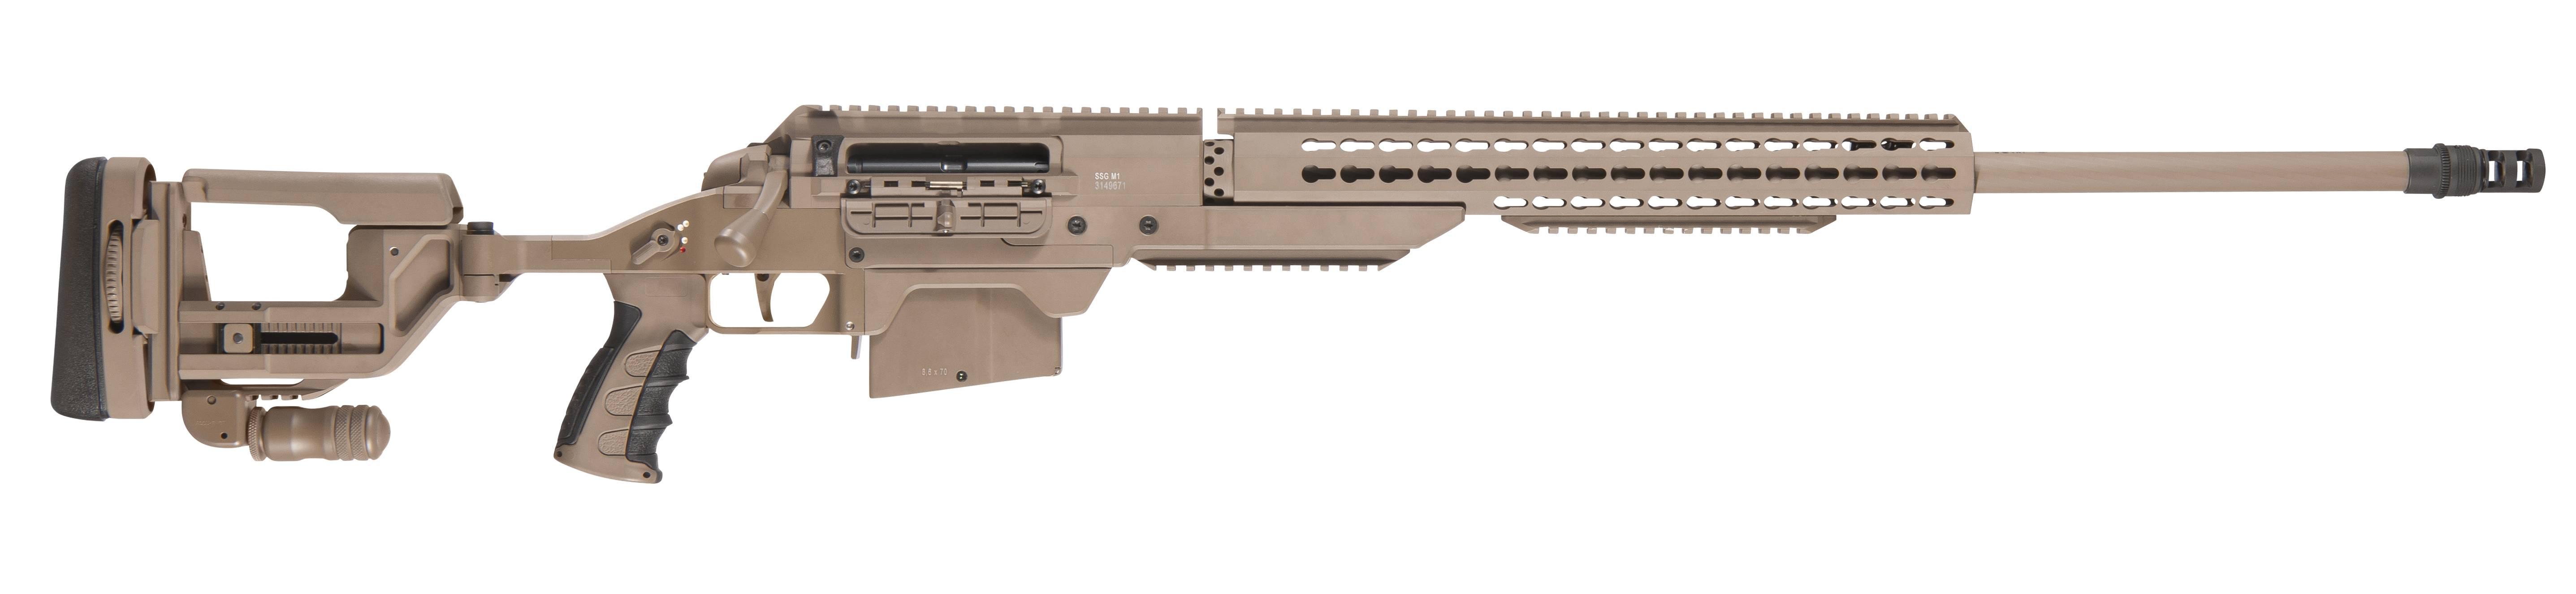 Снайперская винтовка steyr ssg 04 / steyr ssg 04 a1